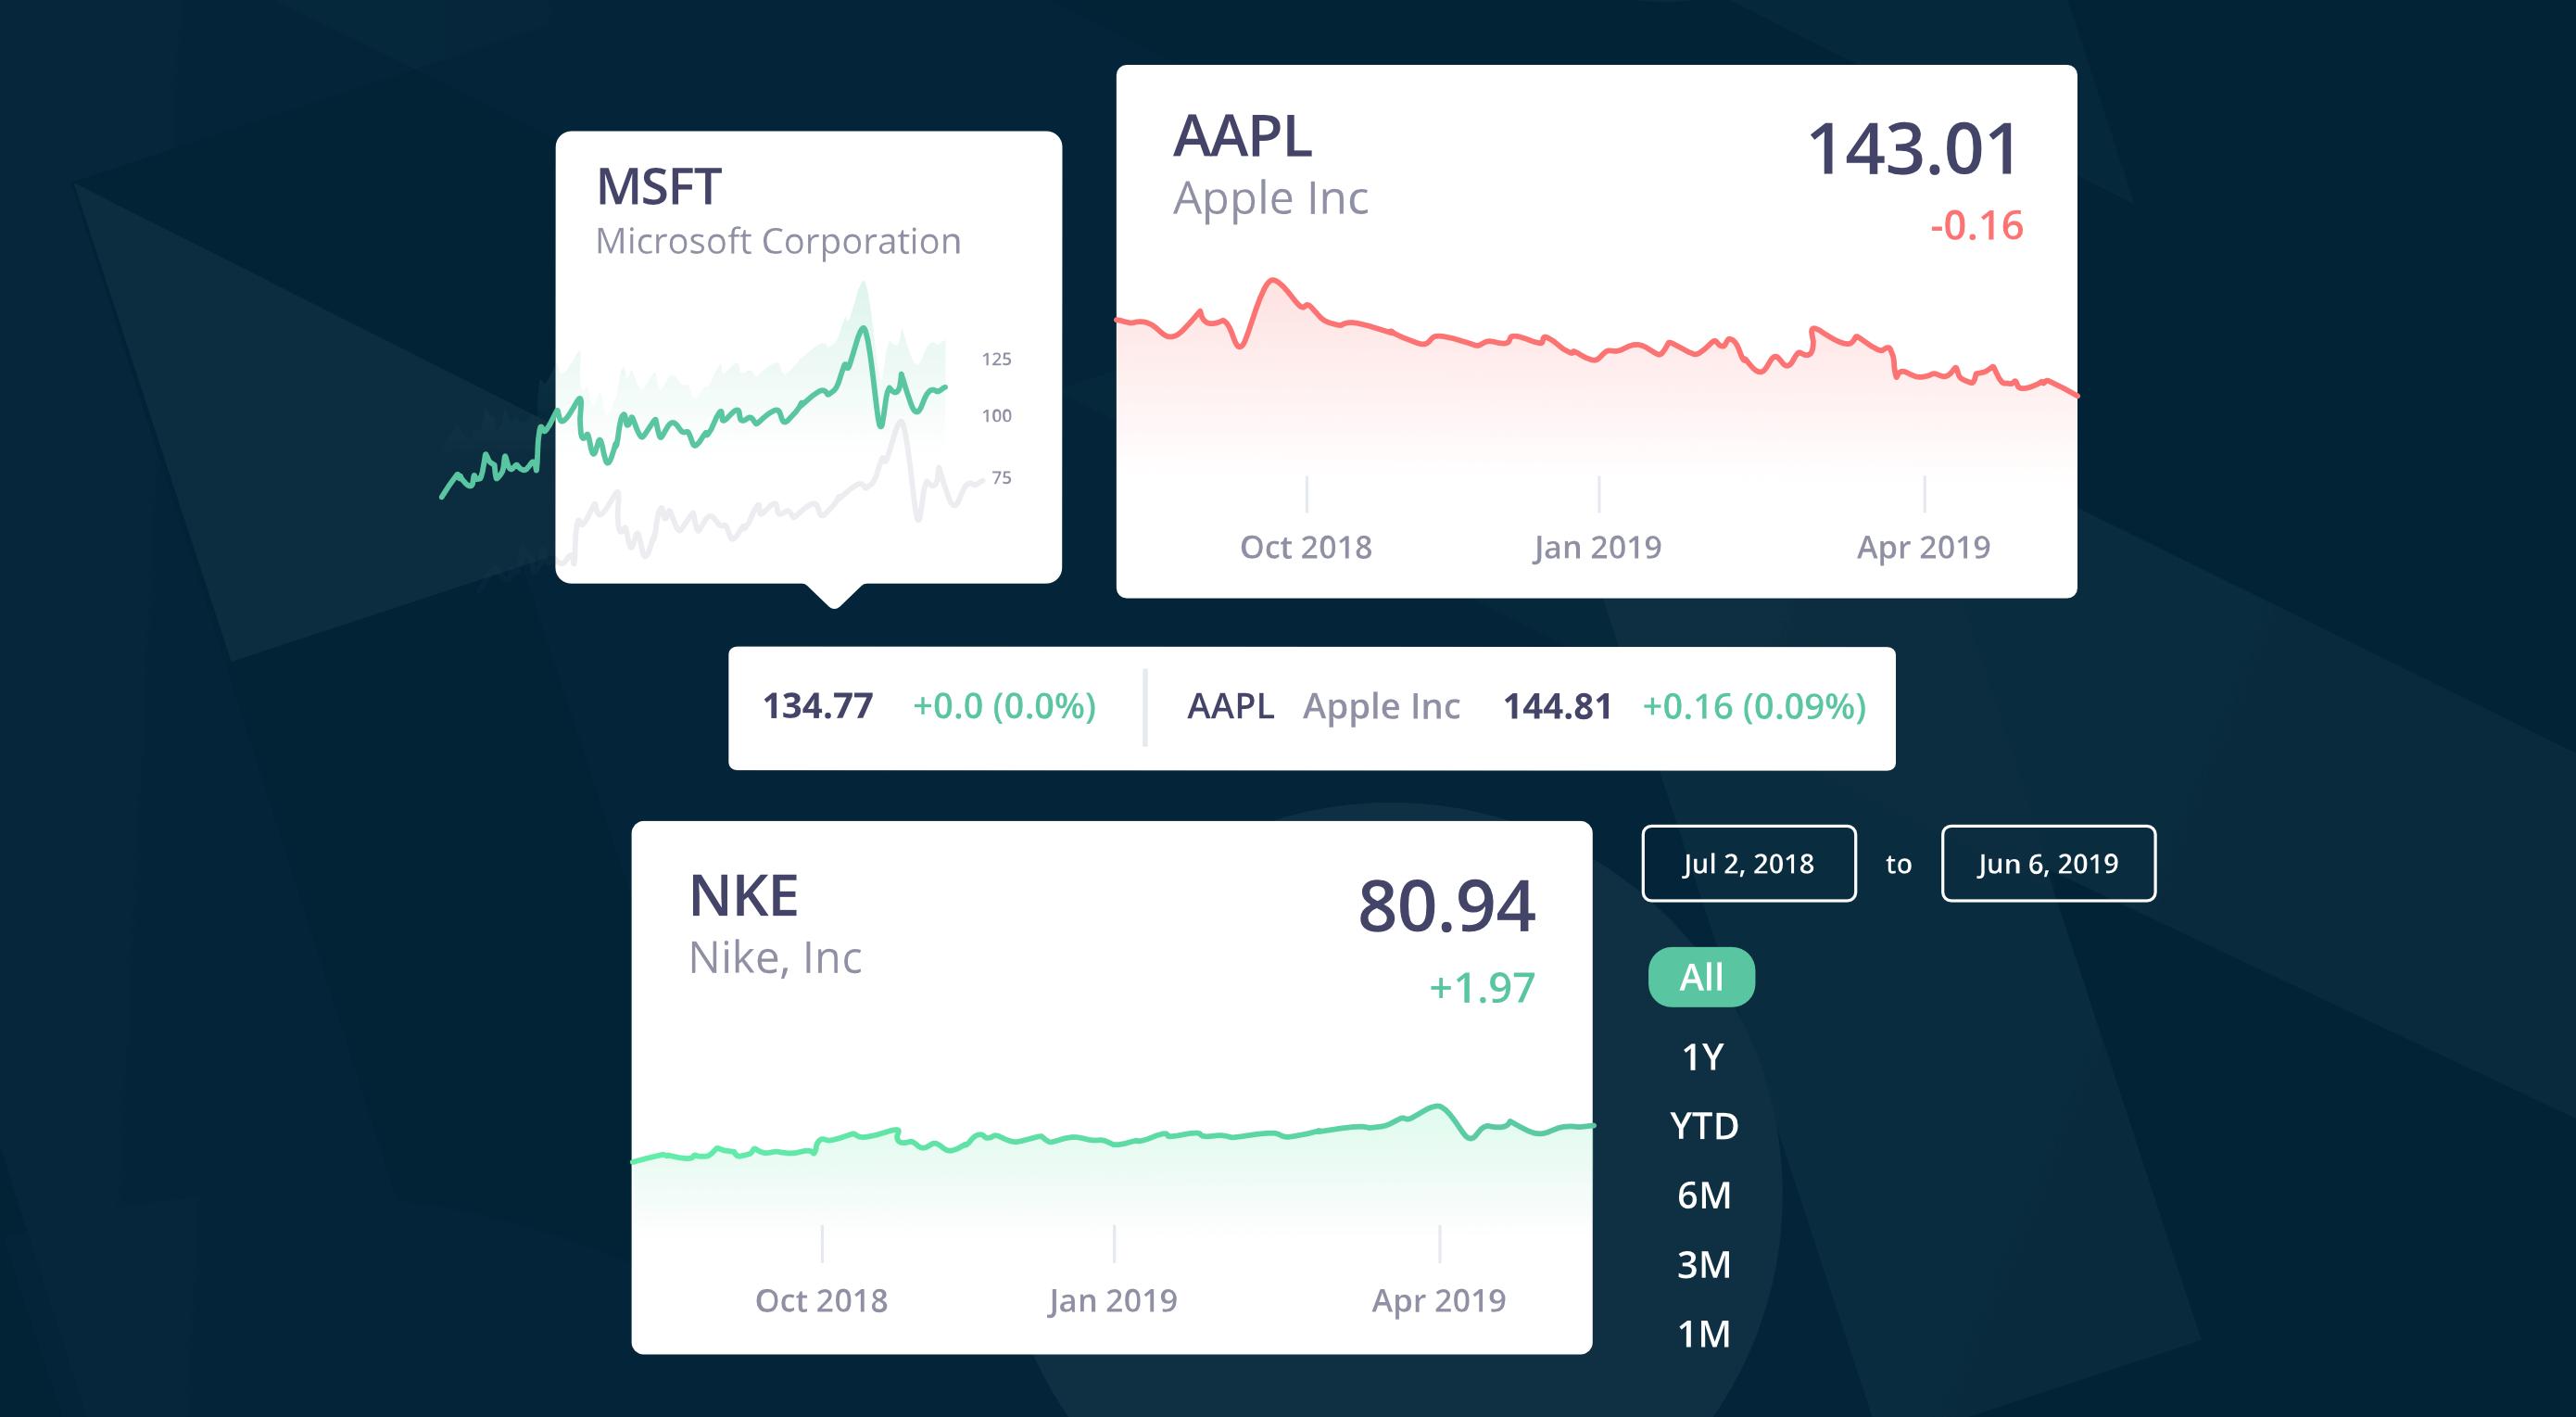 Real-Time Stock Data Using Marketplace's API